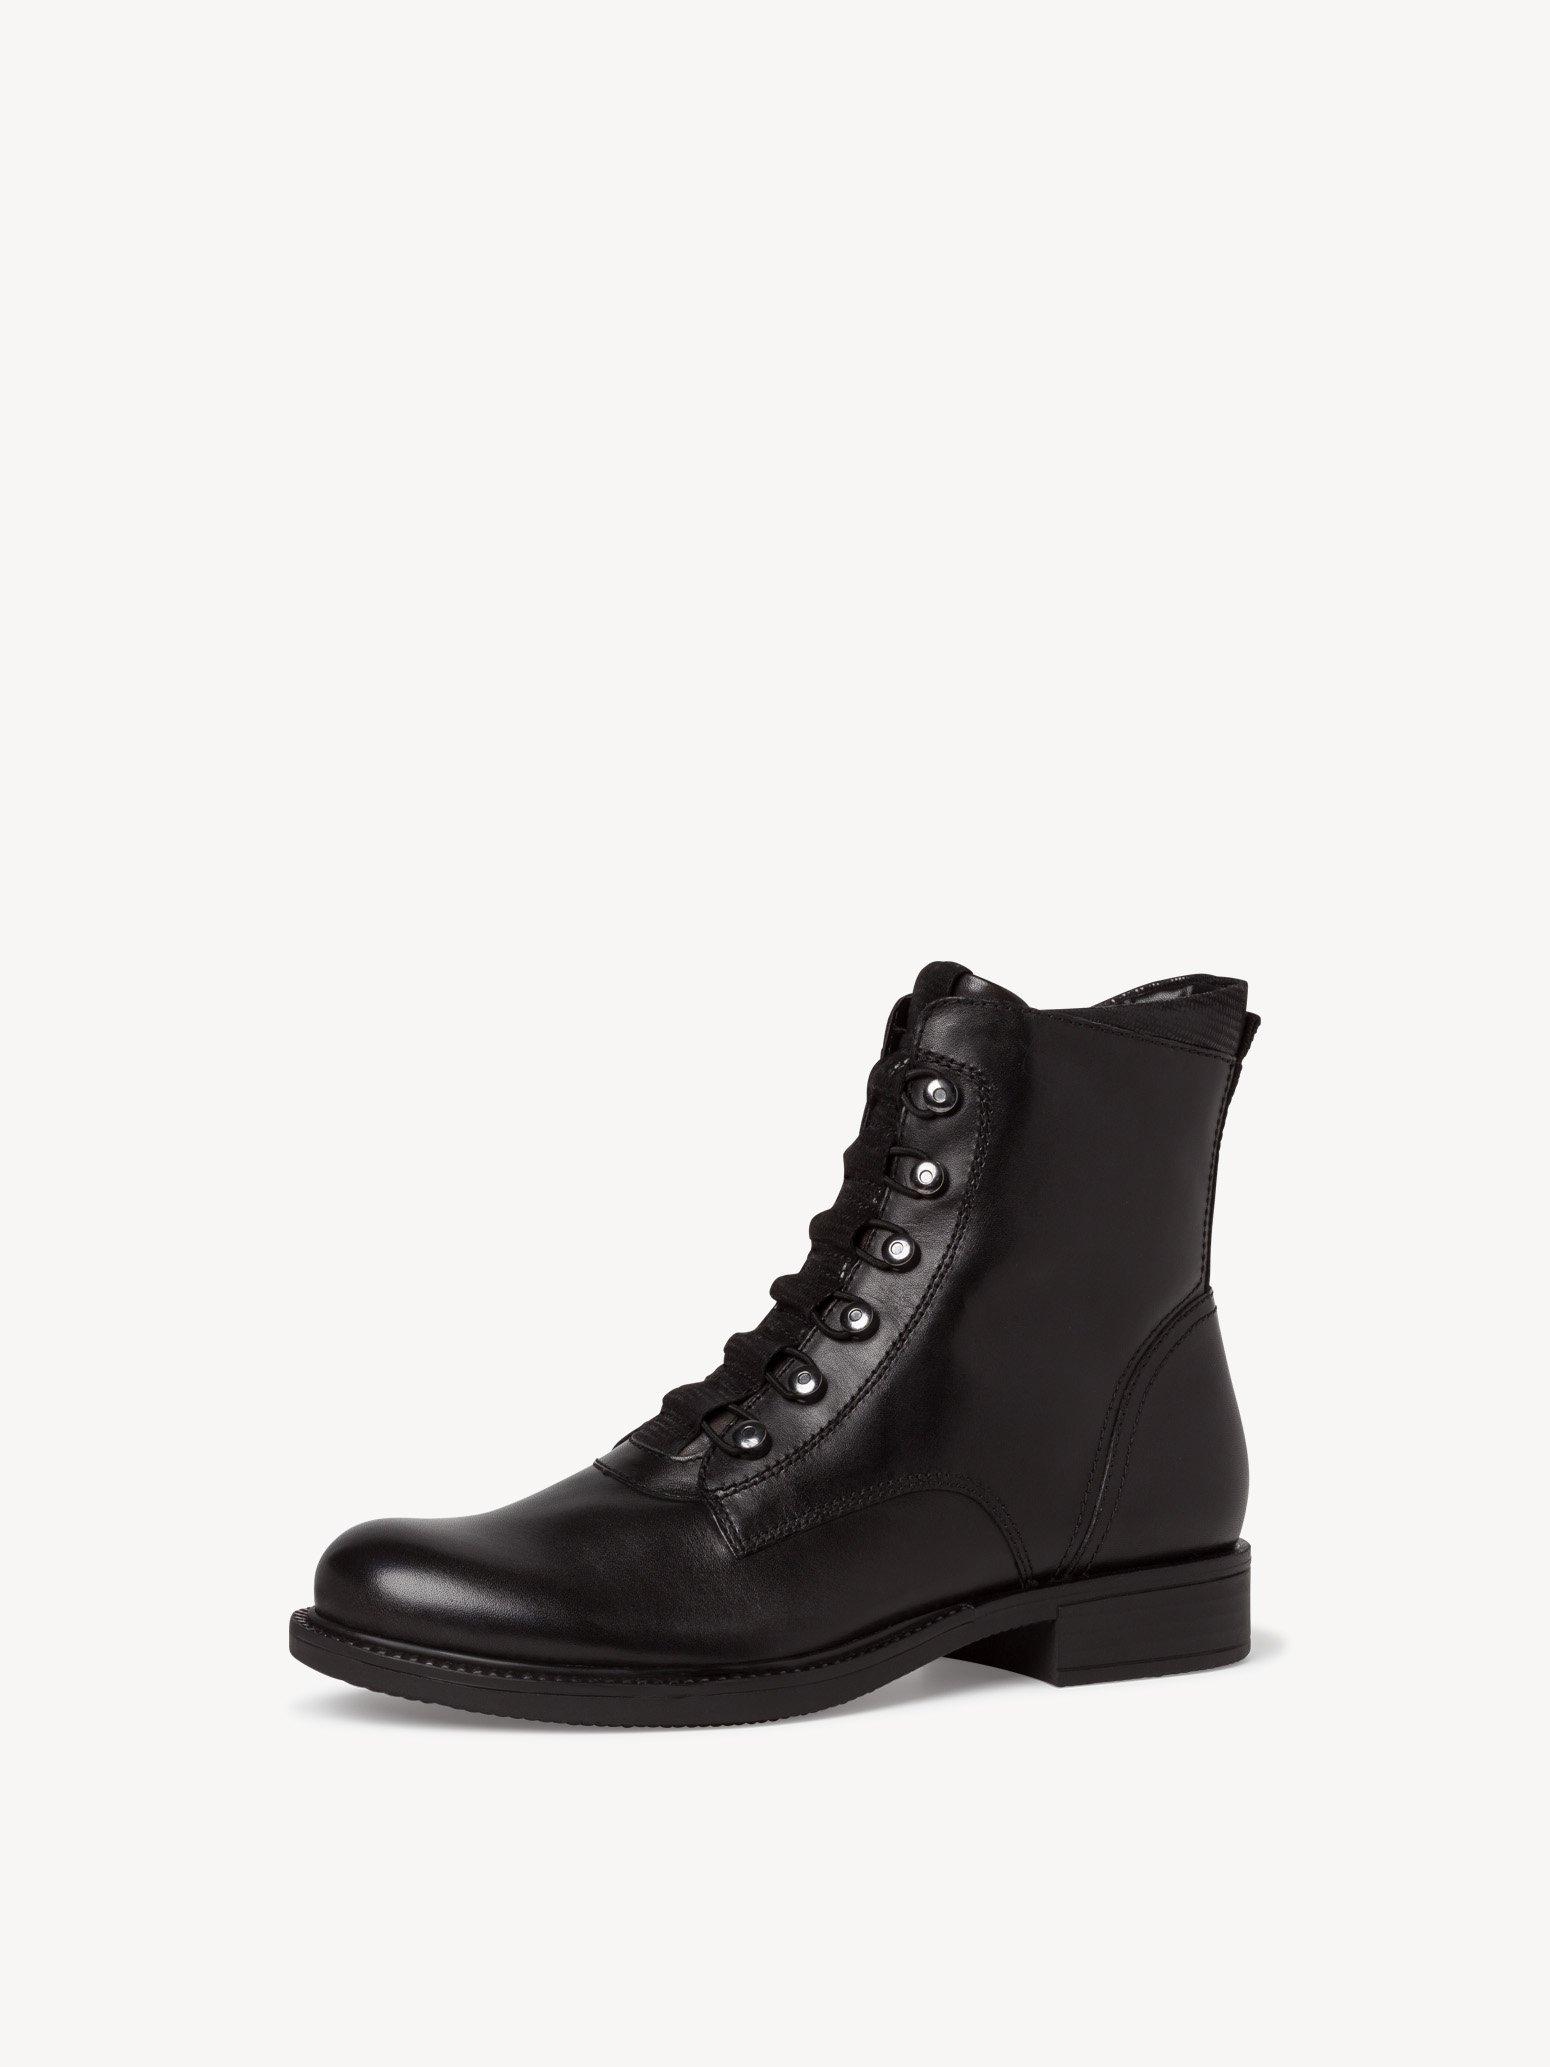 Ботинки Tamaris 1-1-25391-25-001